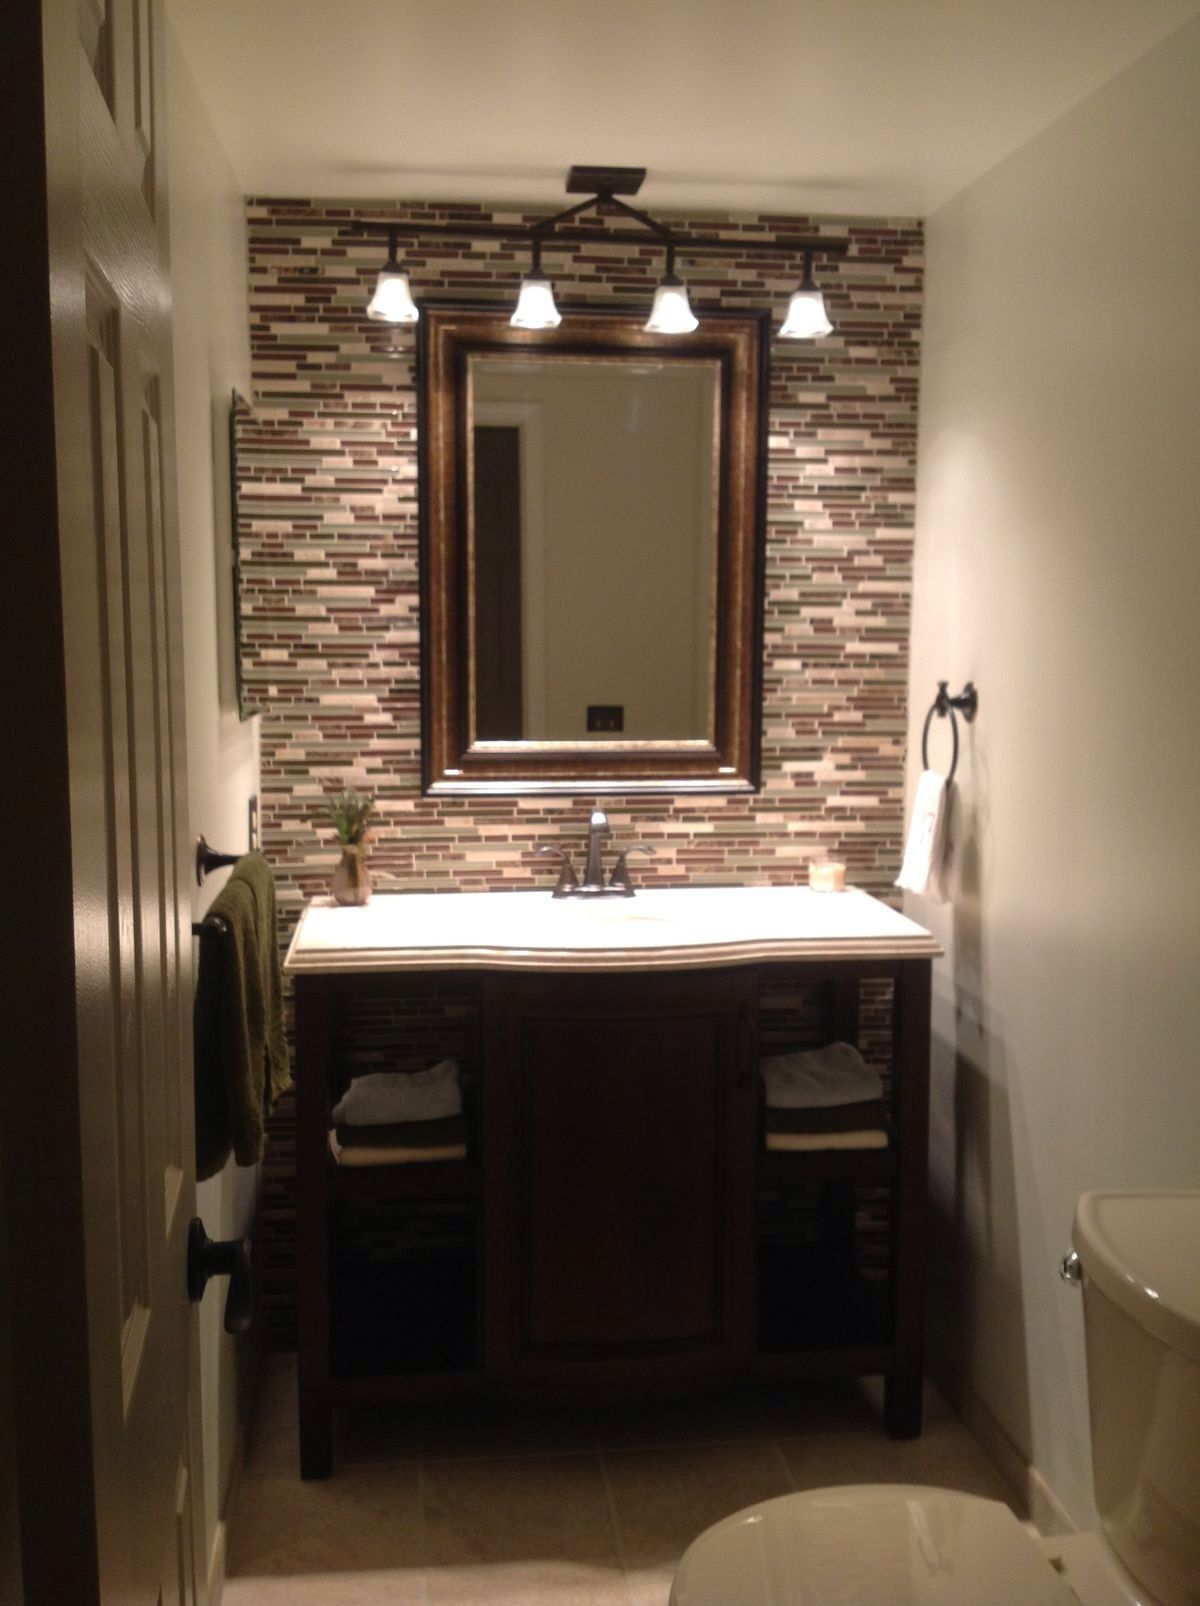 13 Best Bathroom Remodel Ideas Makeovers Design Small Bathroom Remodel Bathrooms Remodel Bathroom Makeover